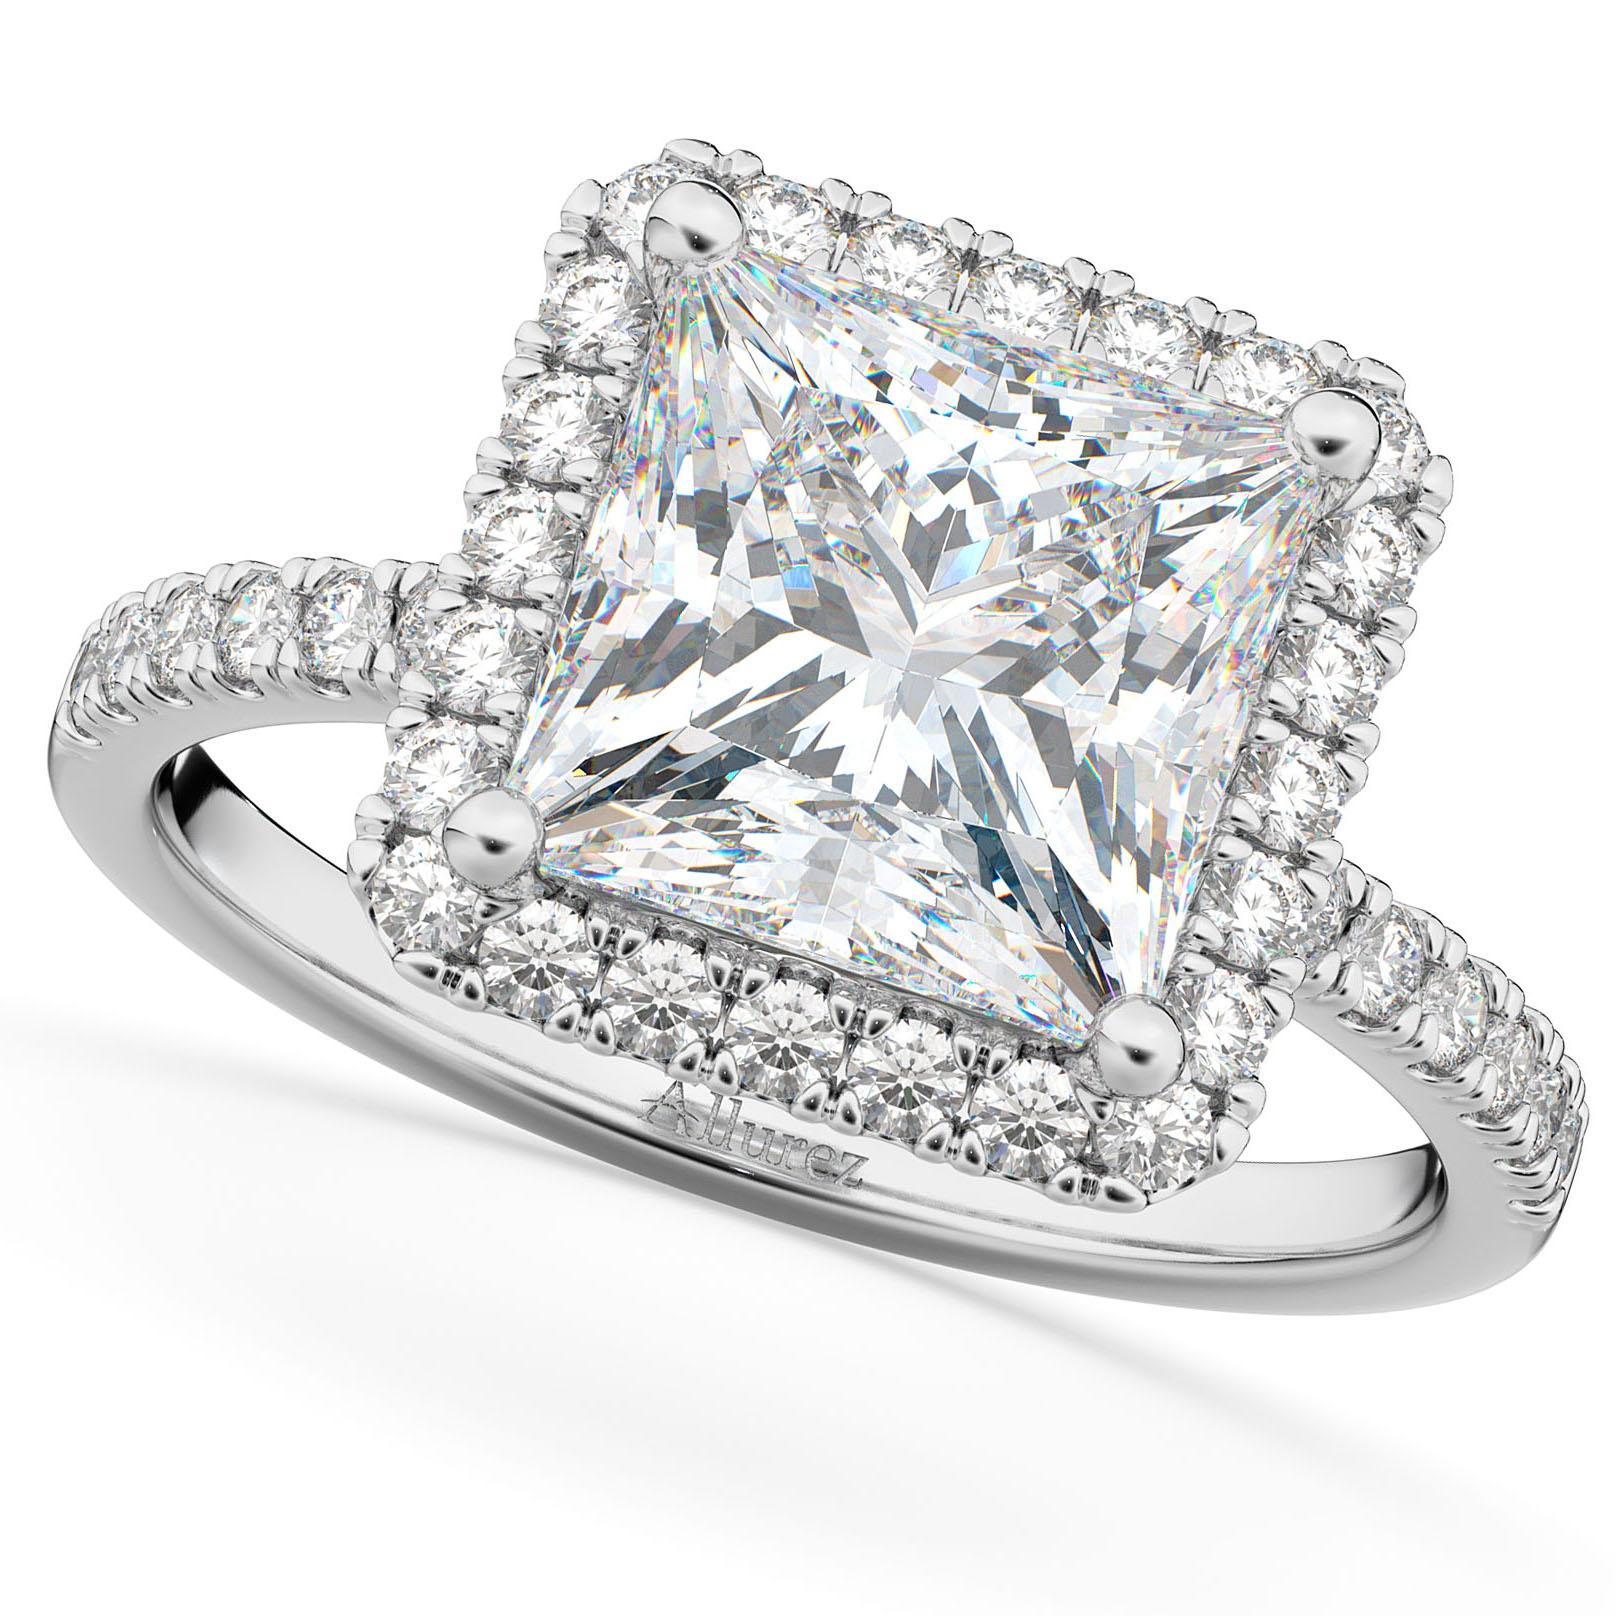 Princess Cut Halo Moissanite & Diamond Engagement Ring 14K White Gold 3.35ct